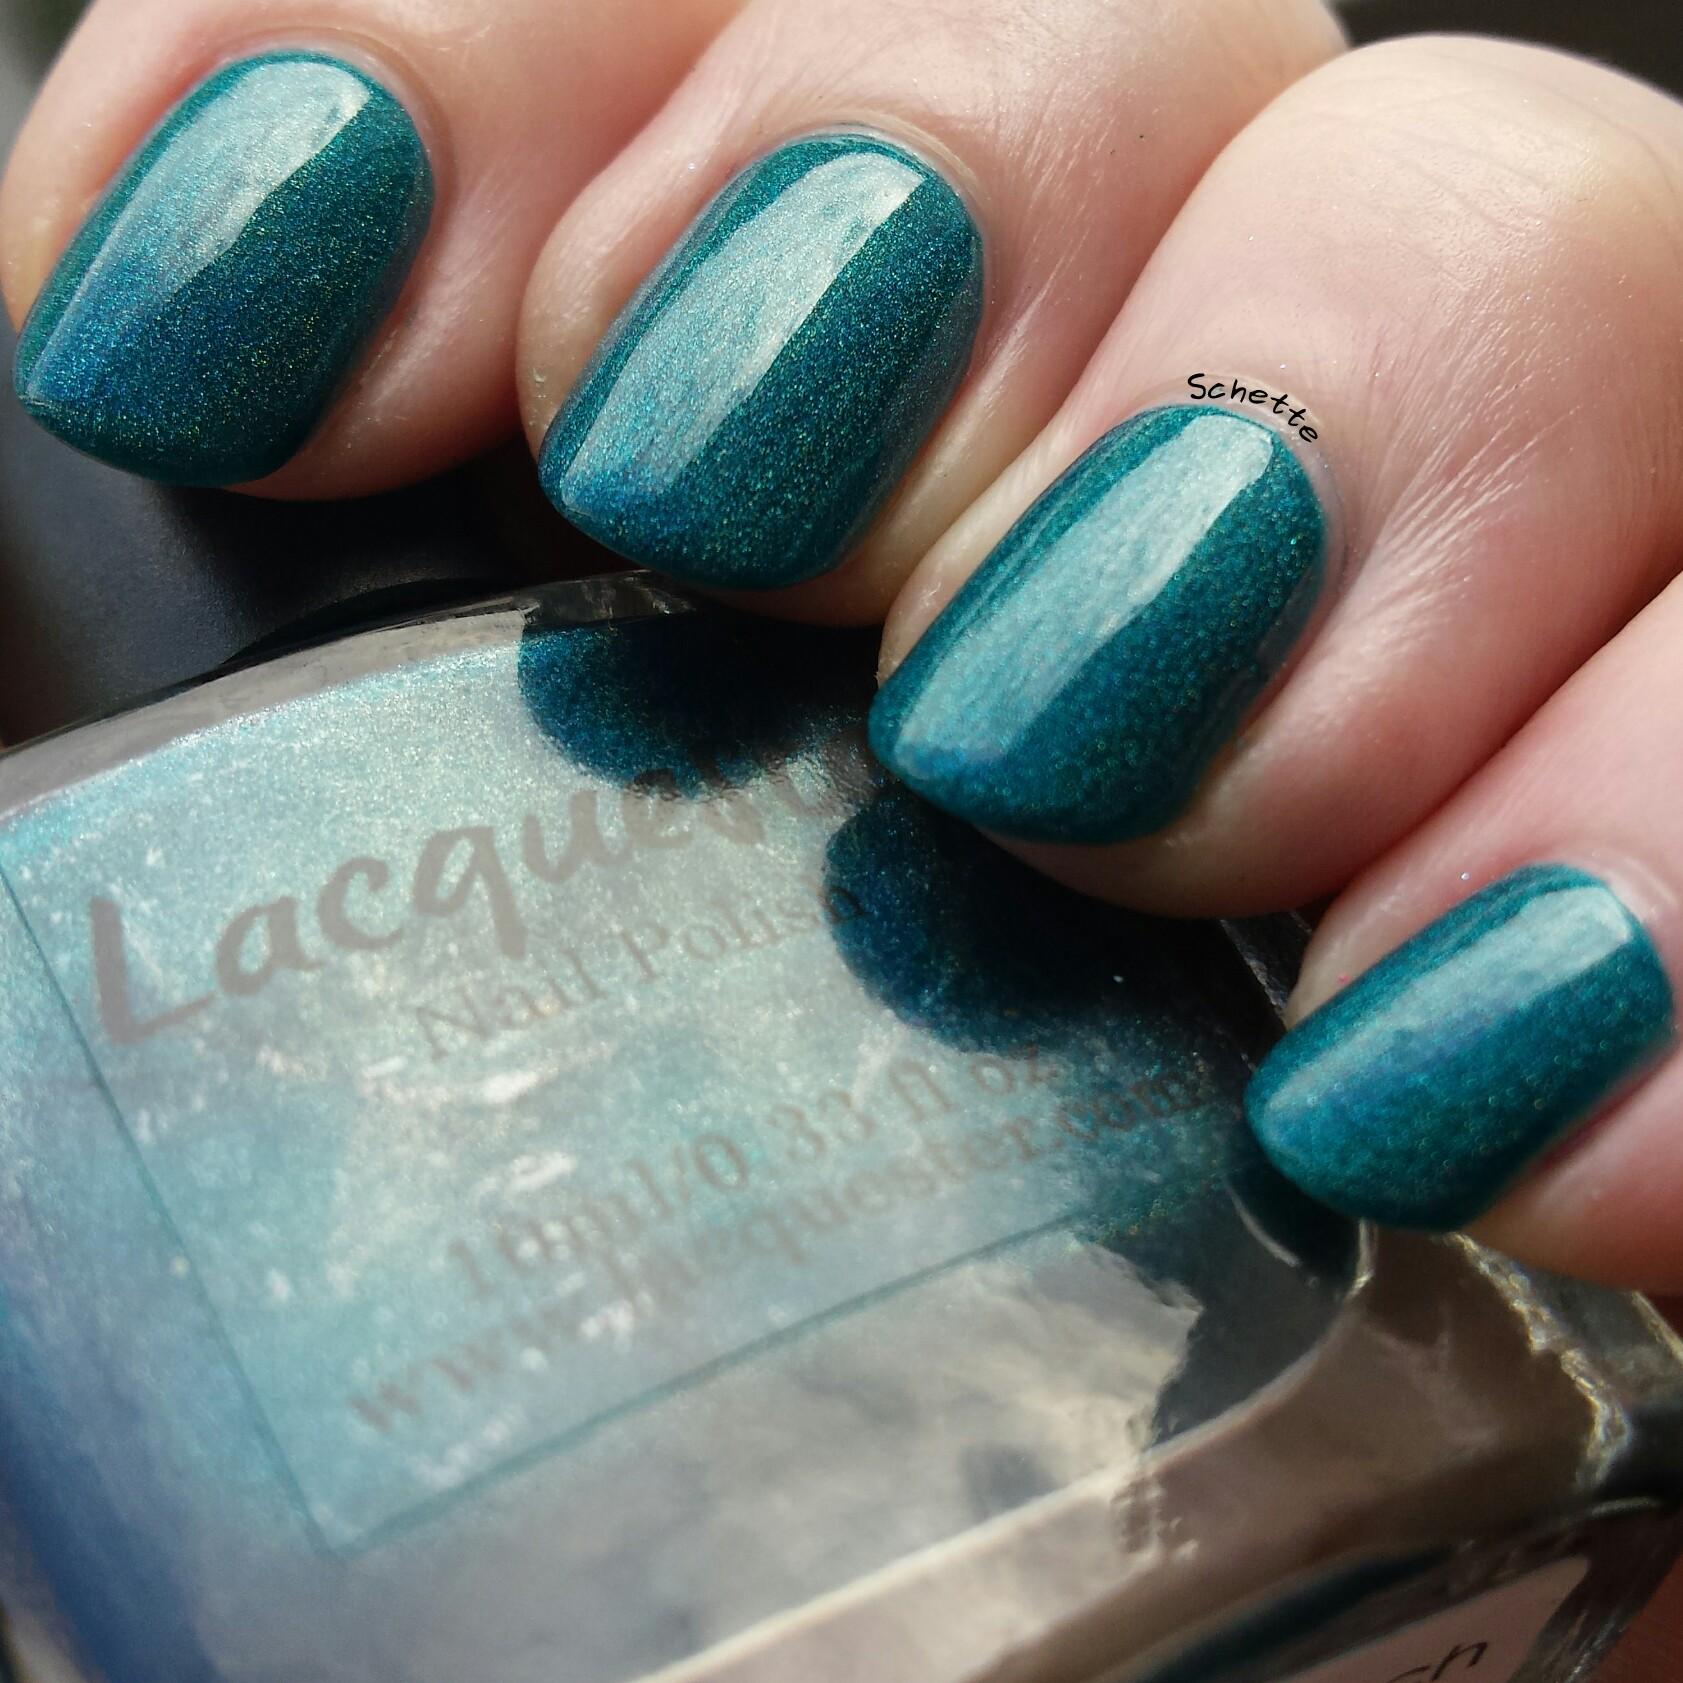 Lacquester - Poseidon's patch